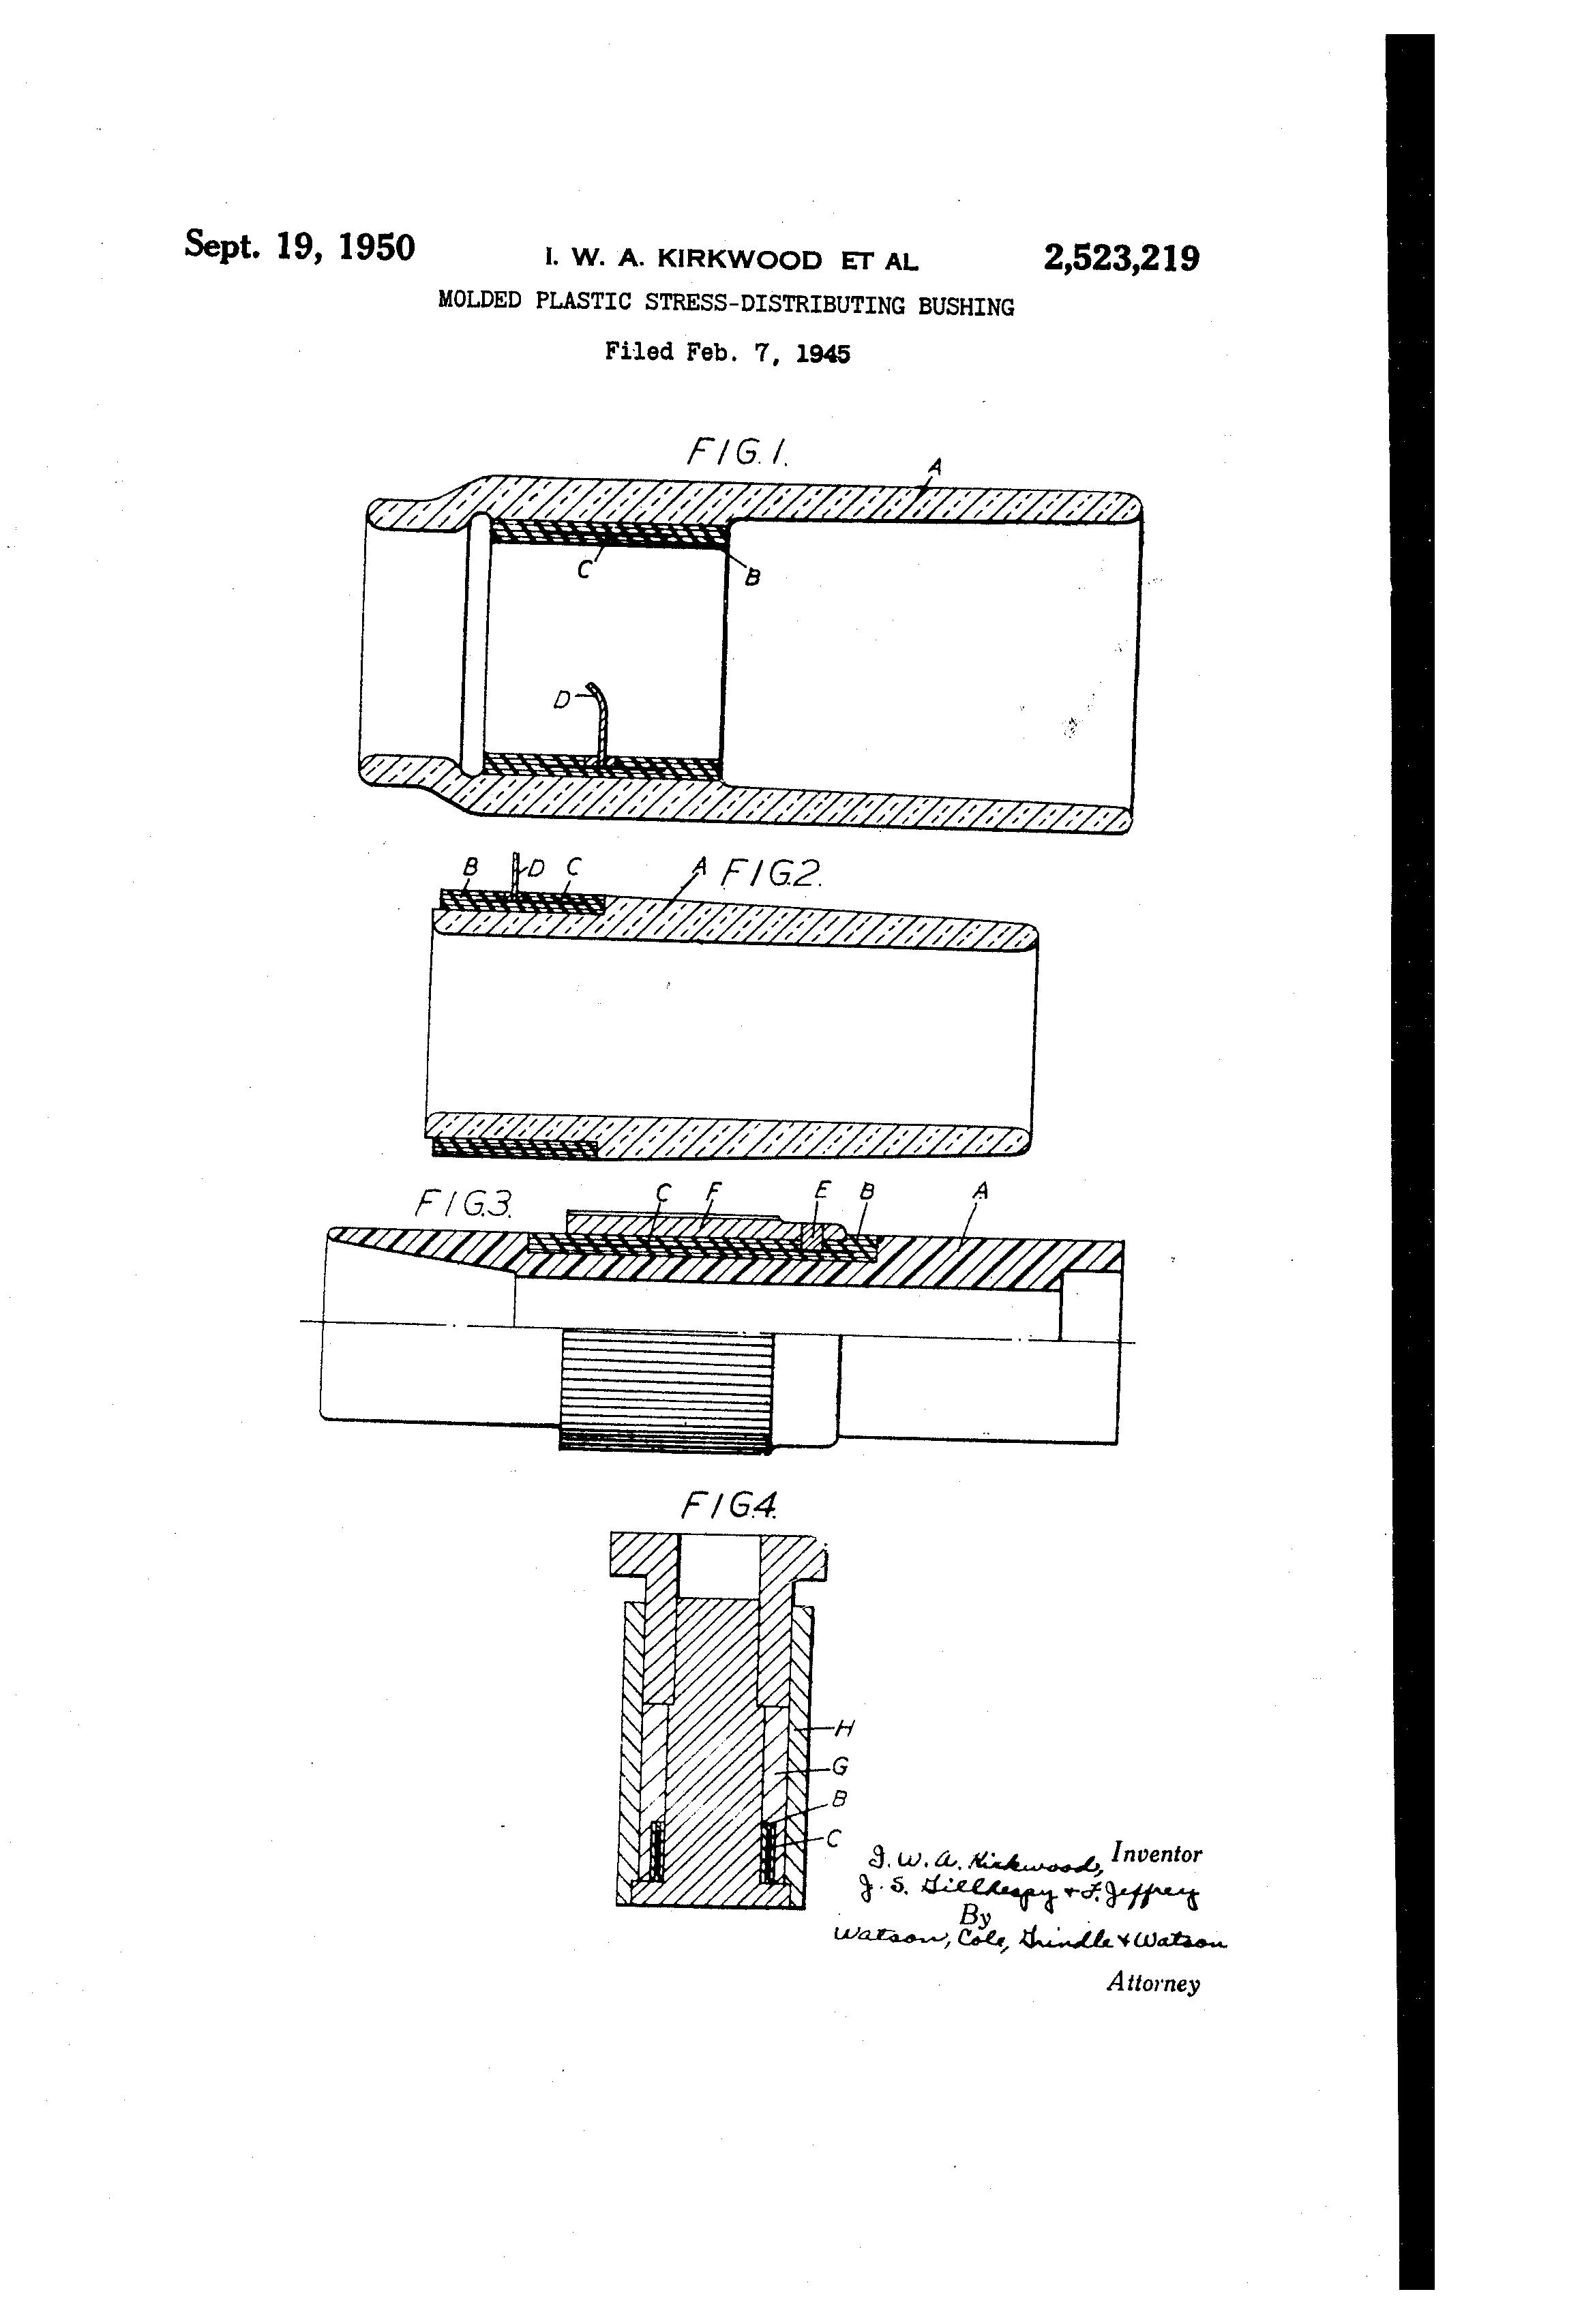 Us2523219 Molded Plastic Stress Distributing Bushing Ar Kw Patent Drawing